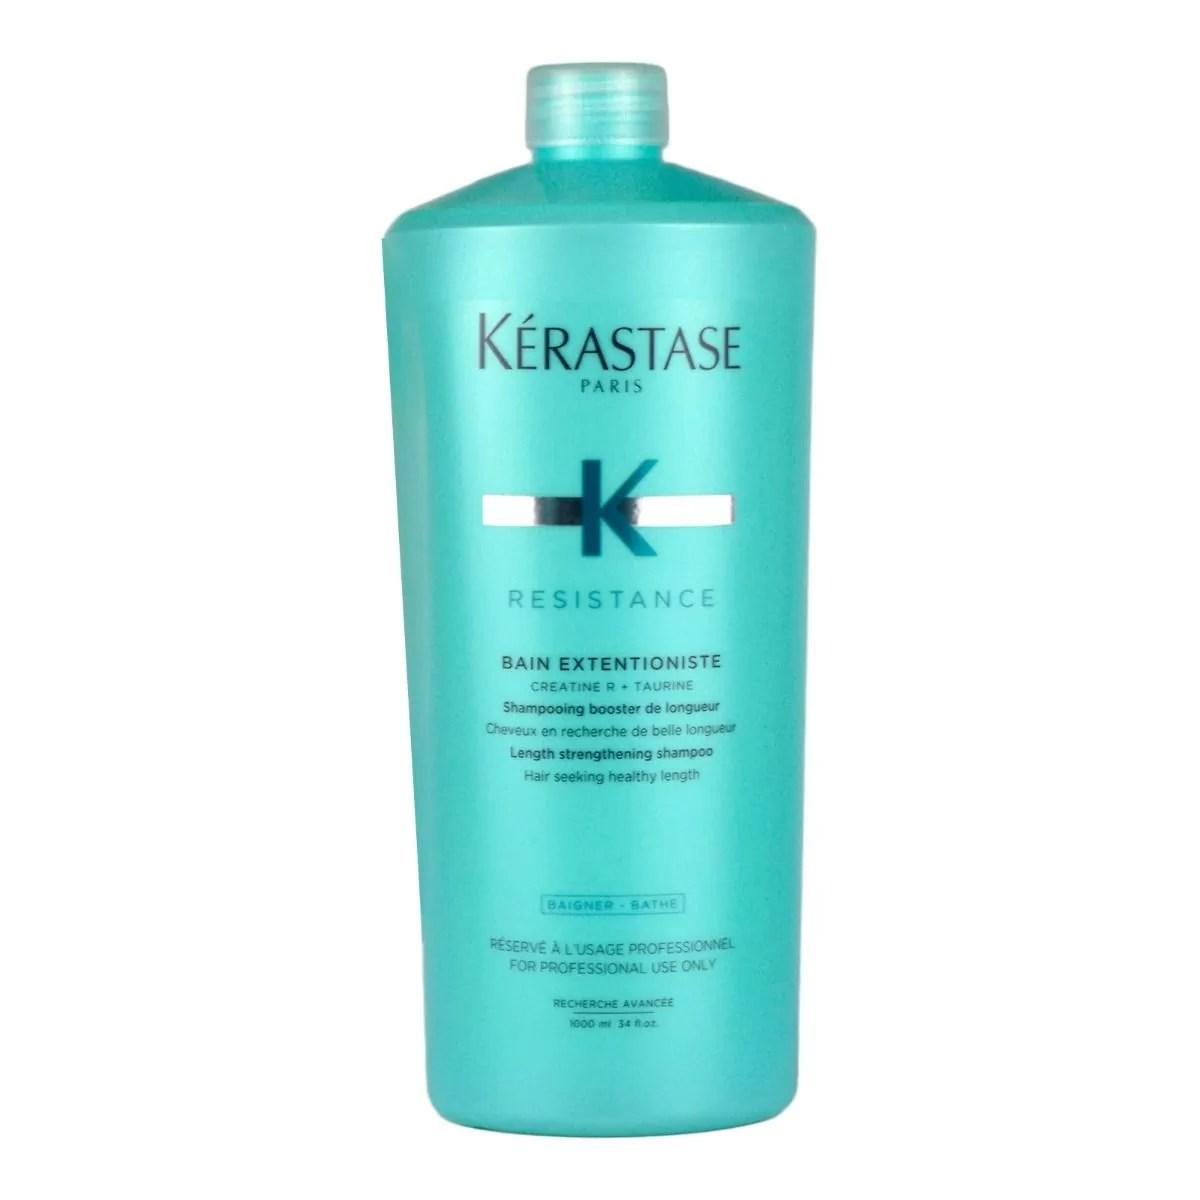 Kerastase Resistance Bain Extentioniste Length Strengthening Shampoo